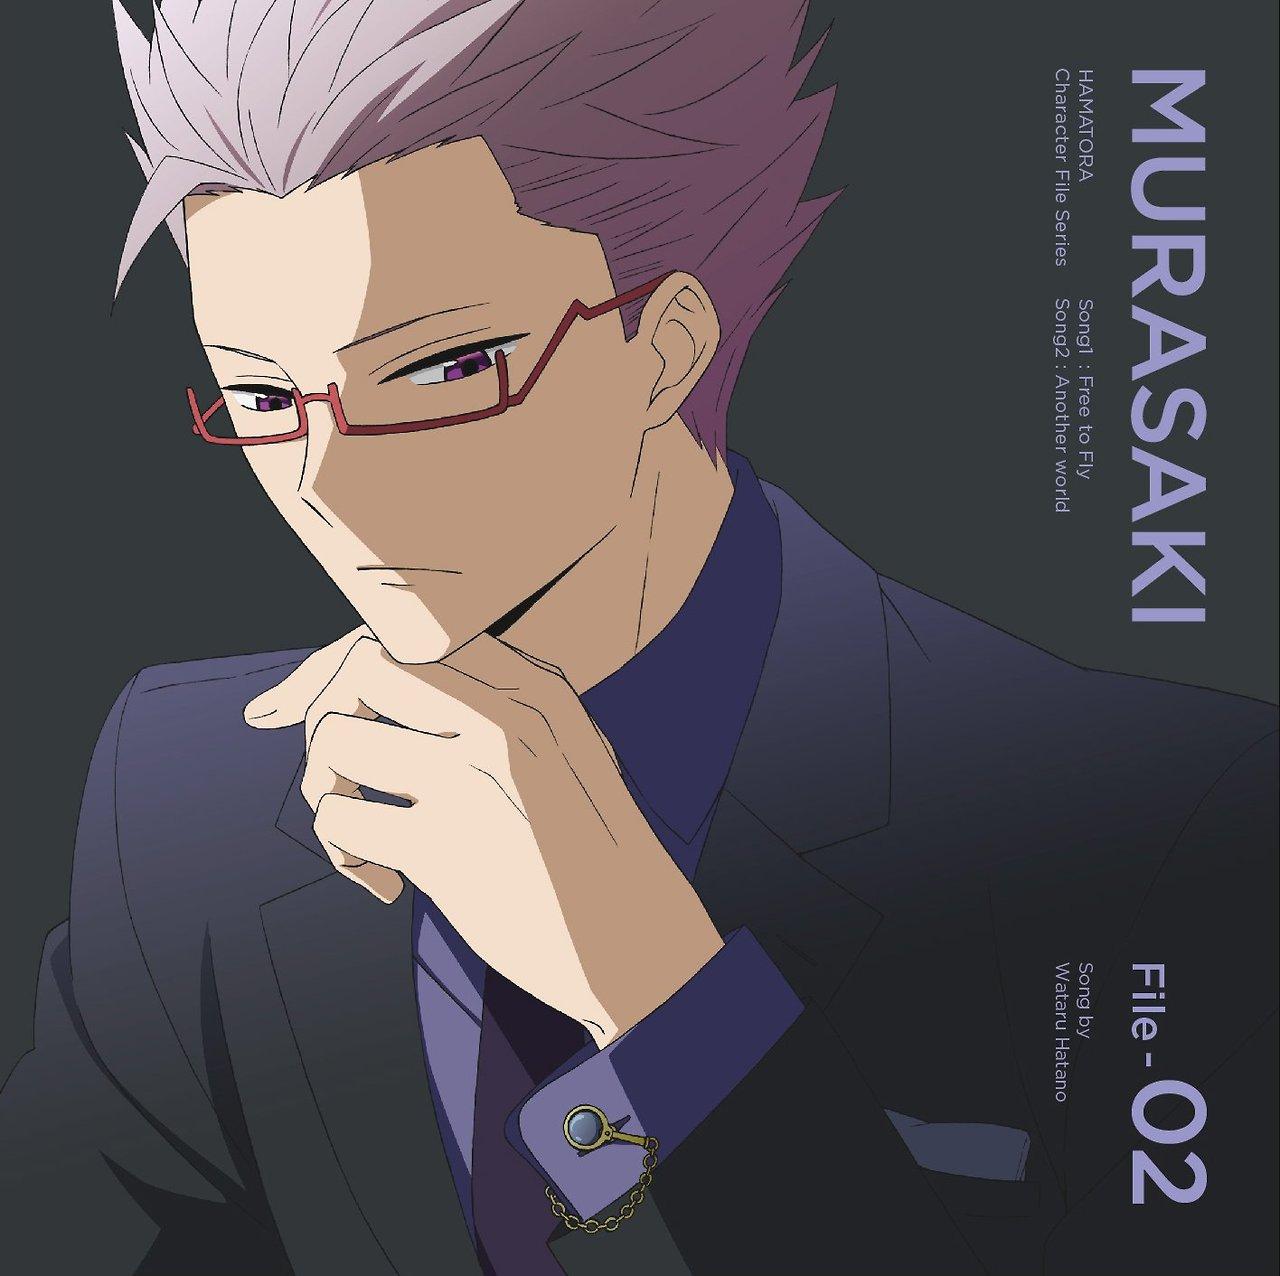 hamatora page 8 of 10 zerochan anime image board